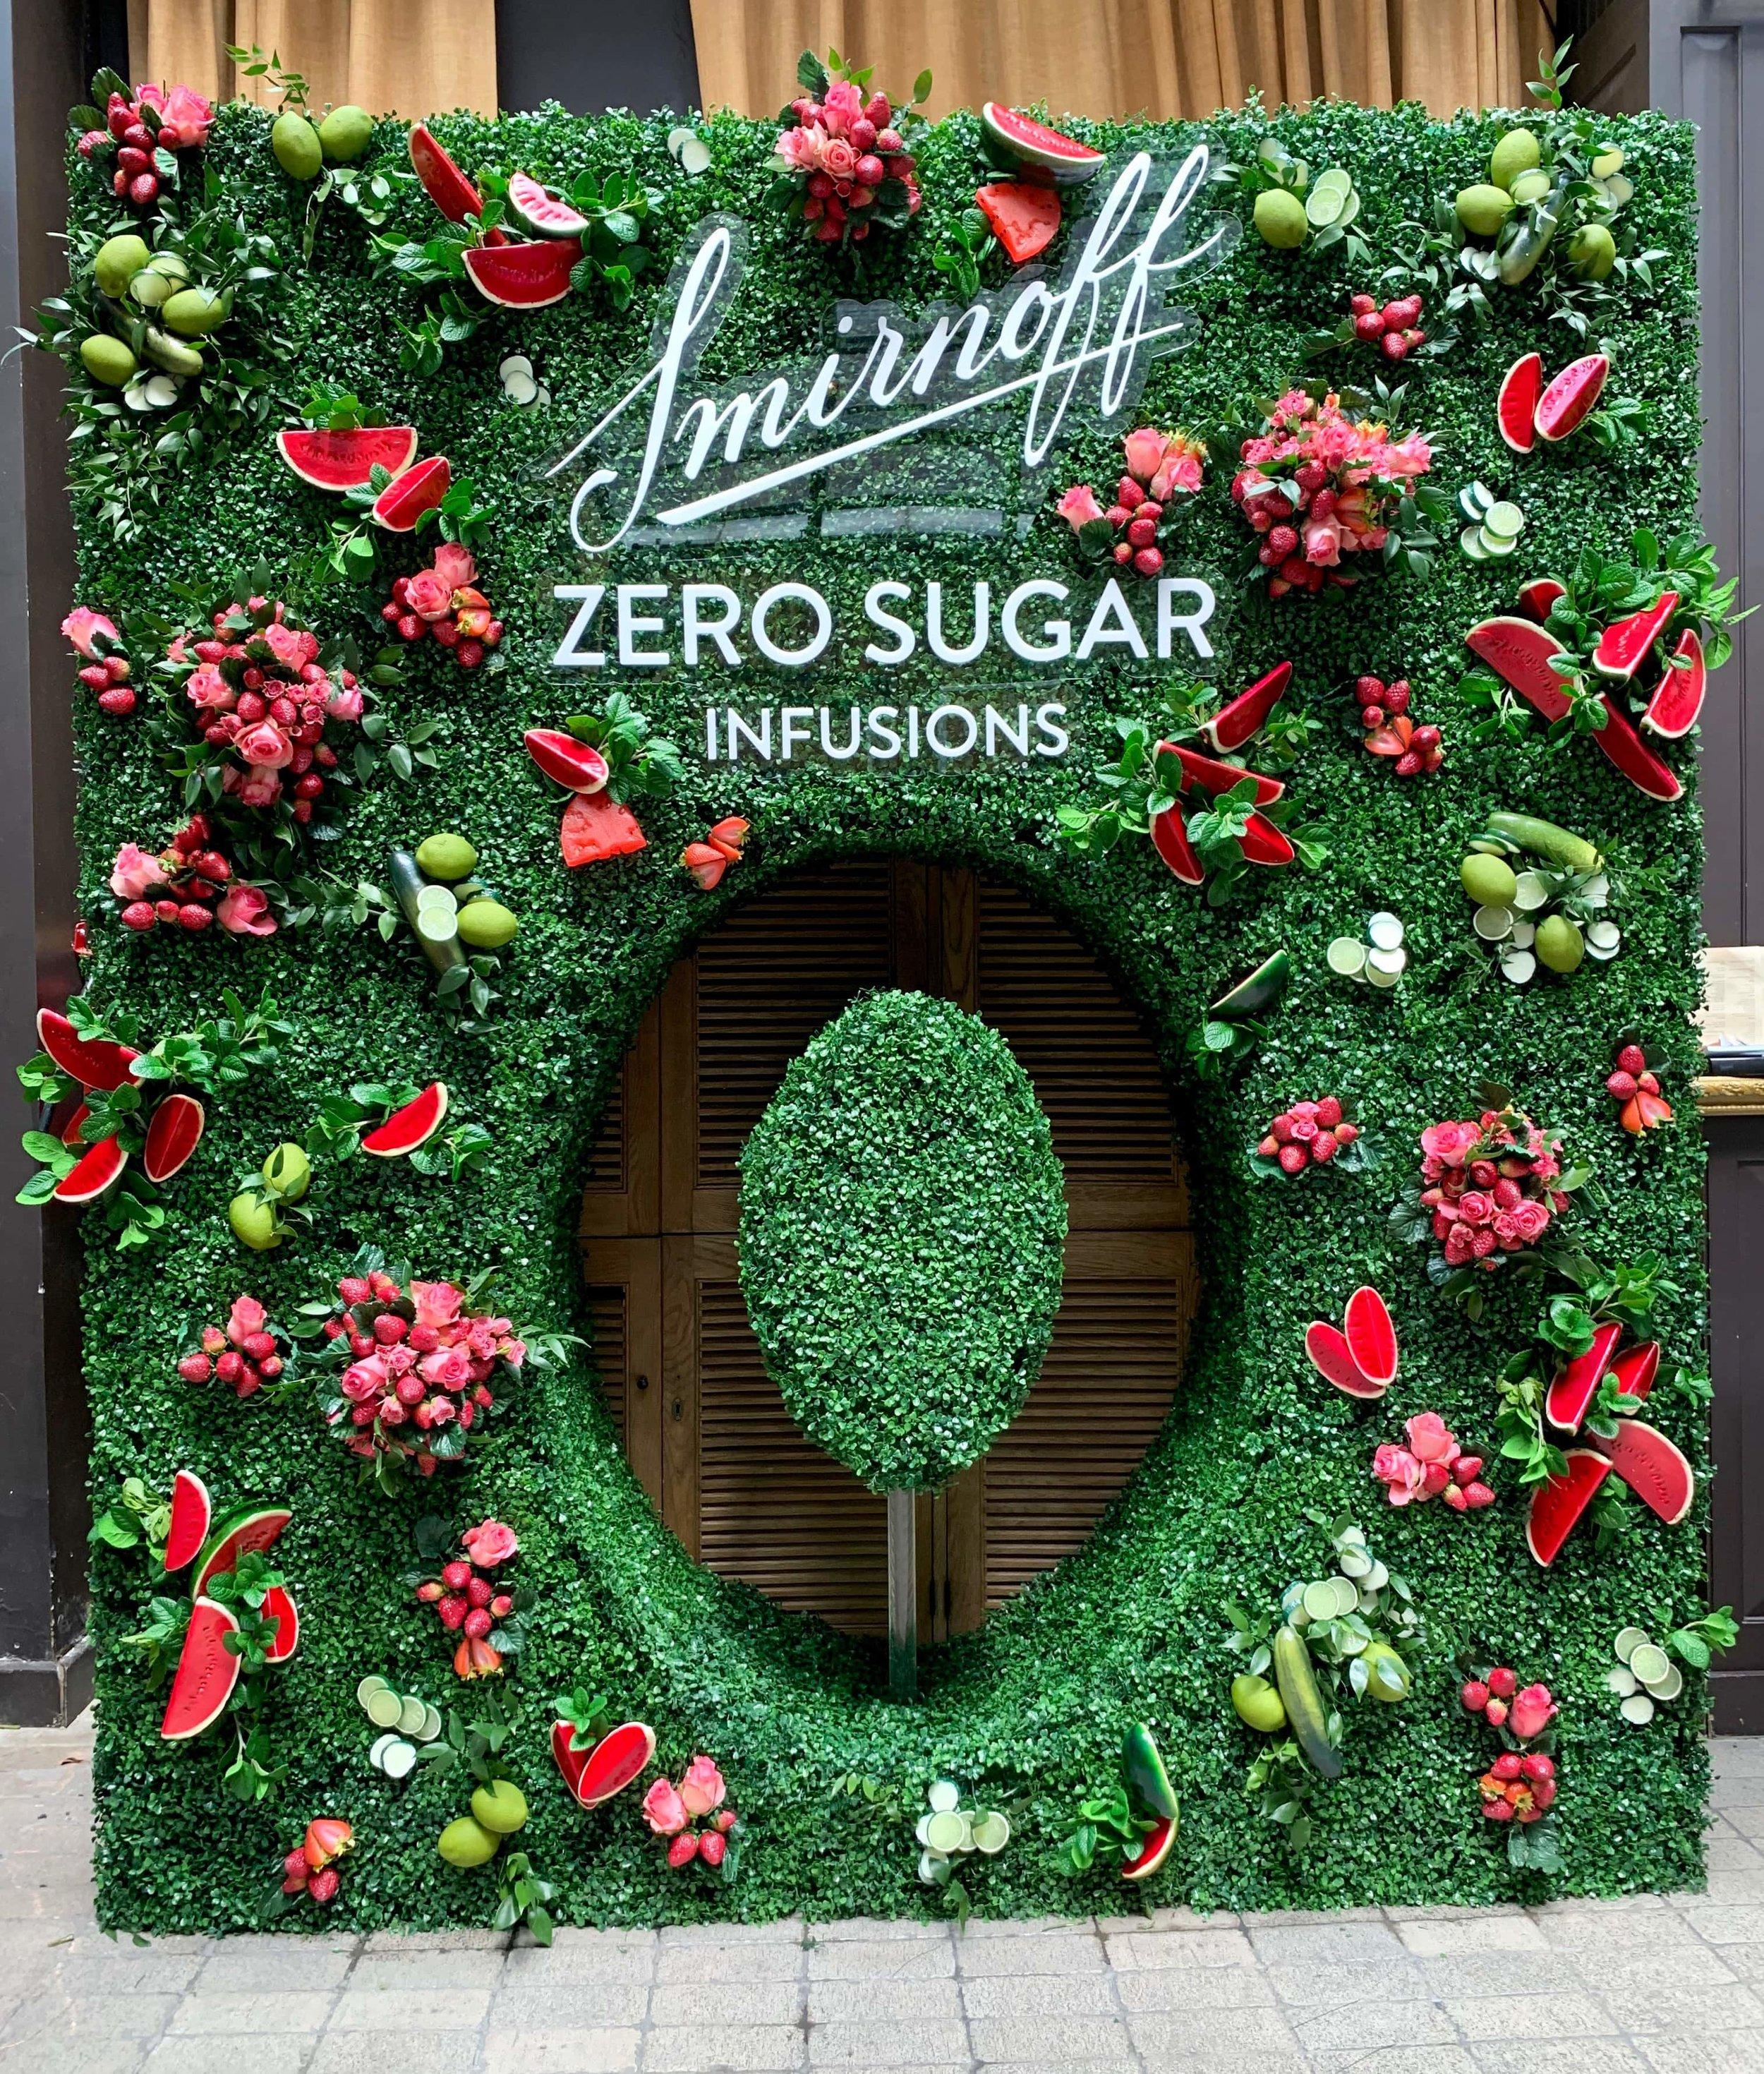 Smirnoff Zero Sugar Infusions Fruit Wall